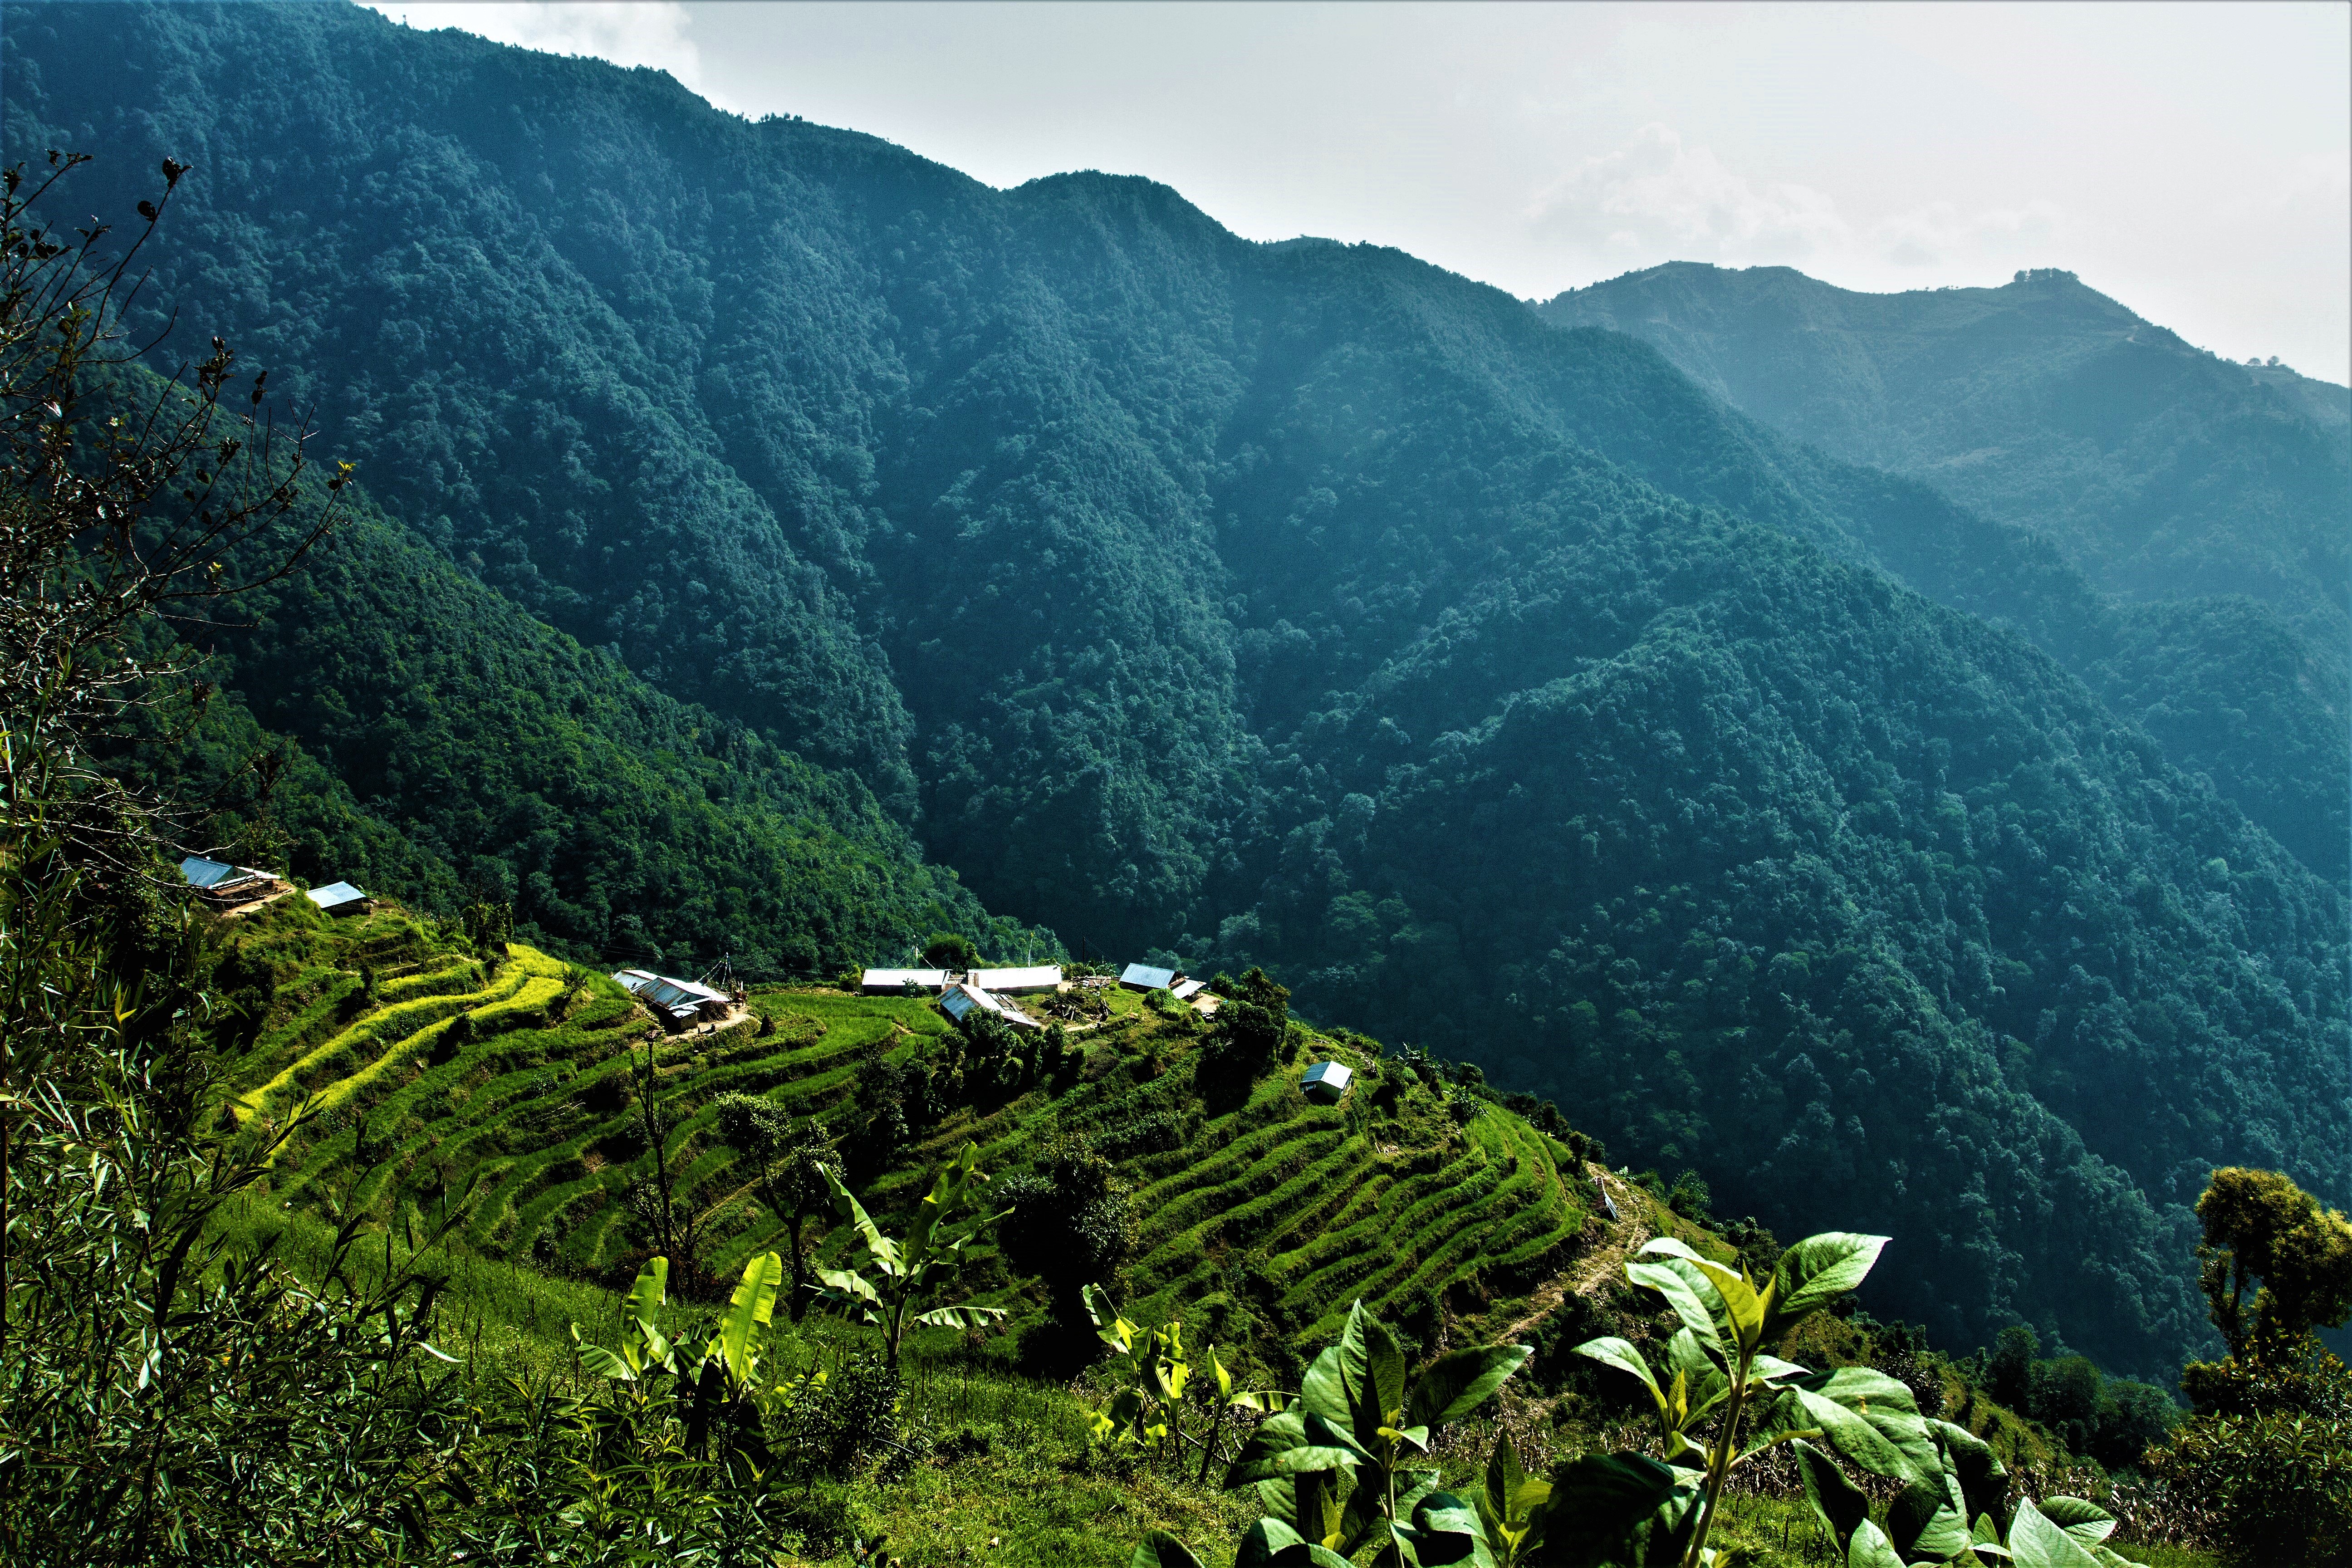 img/village-panorama.jpg